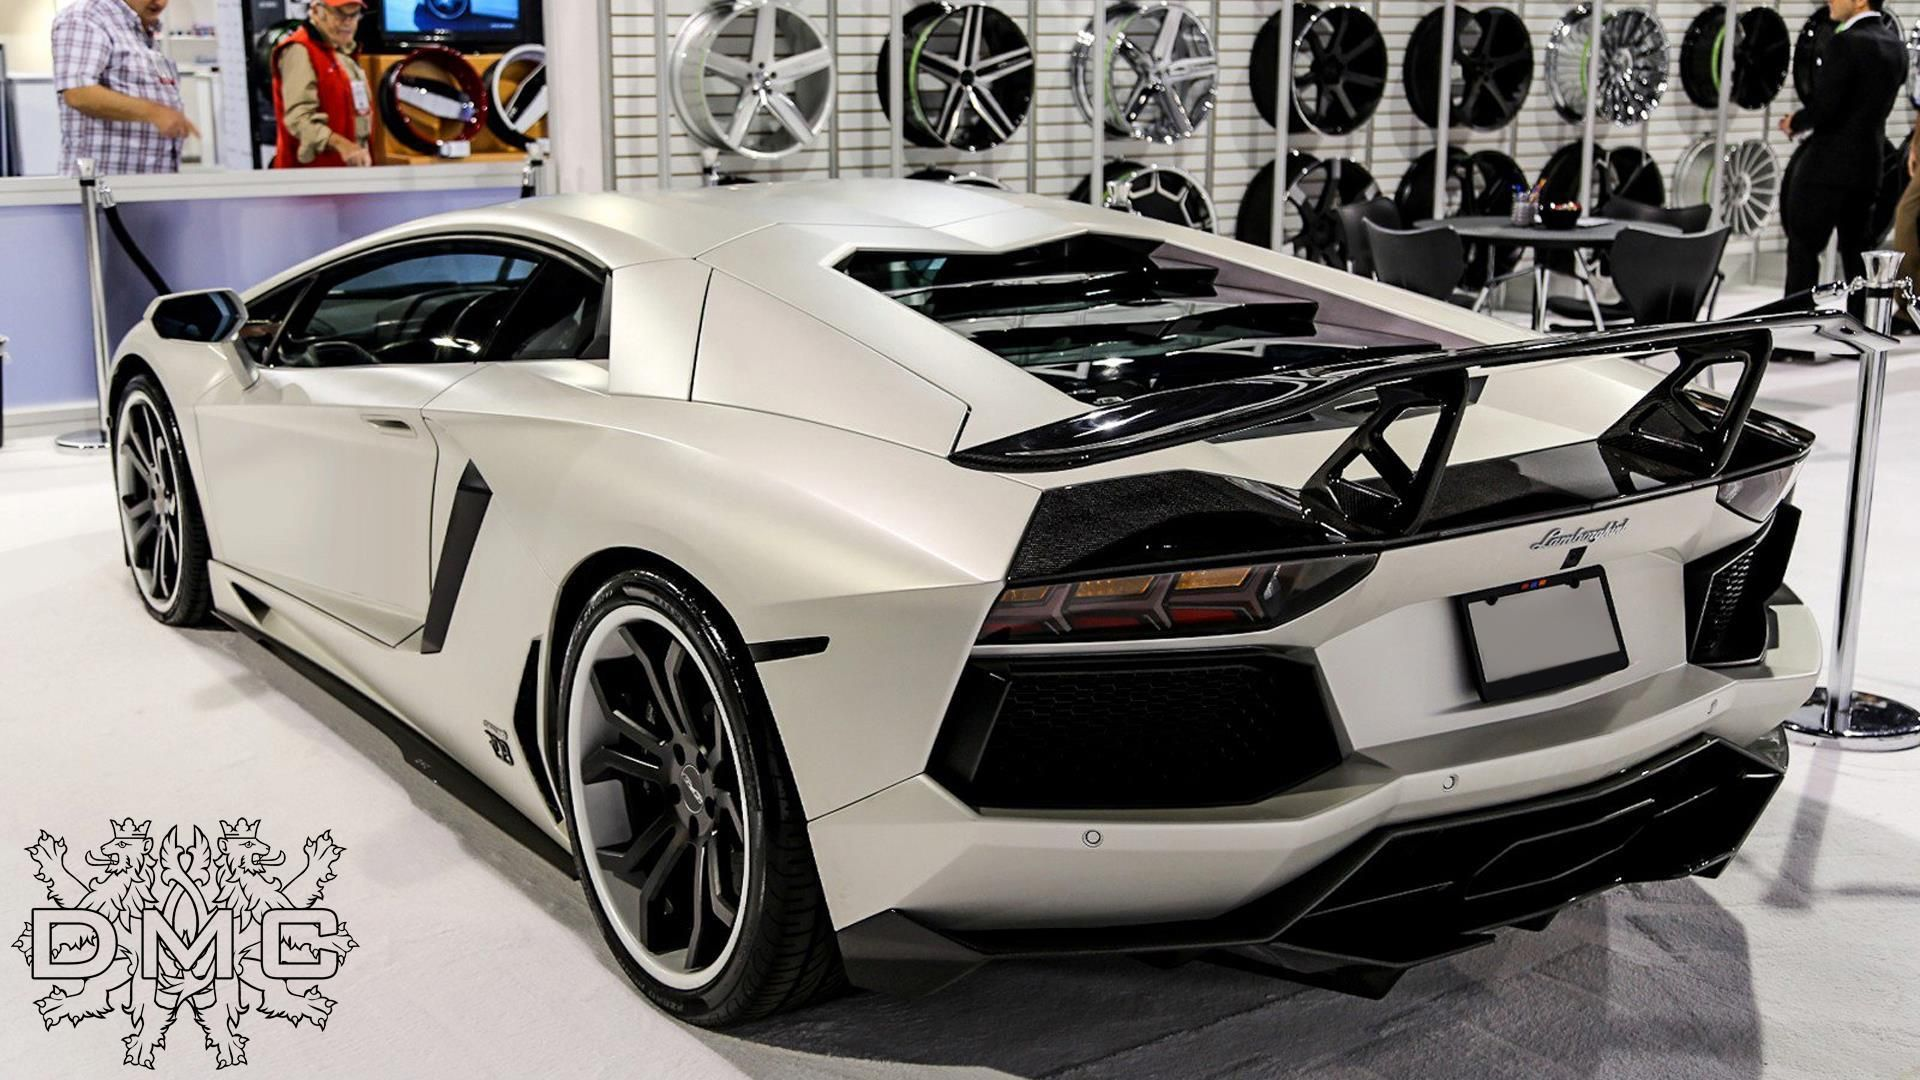 White DMC Aventador back | Lamborghini aventador ...